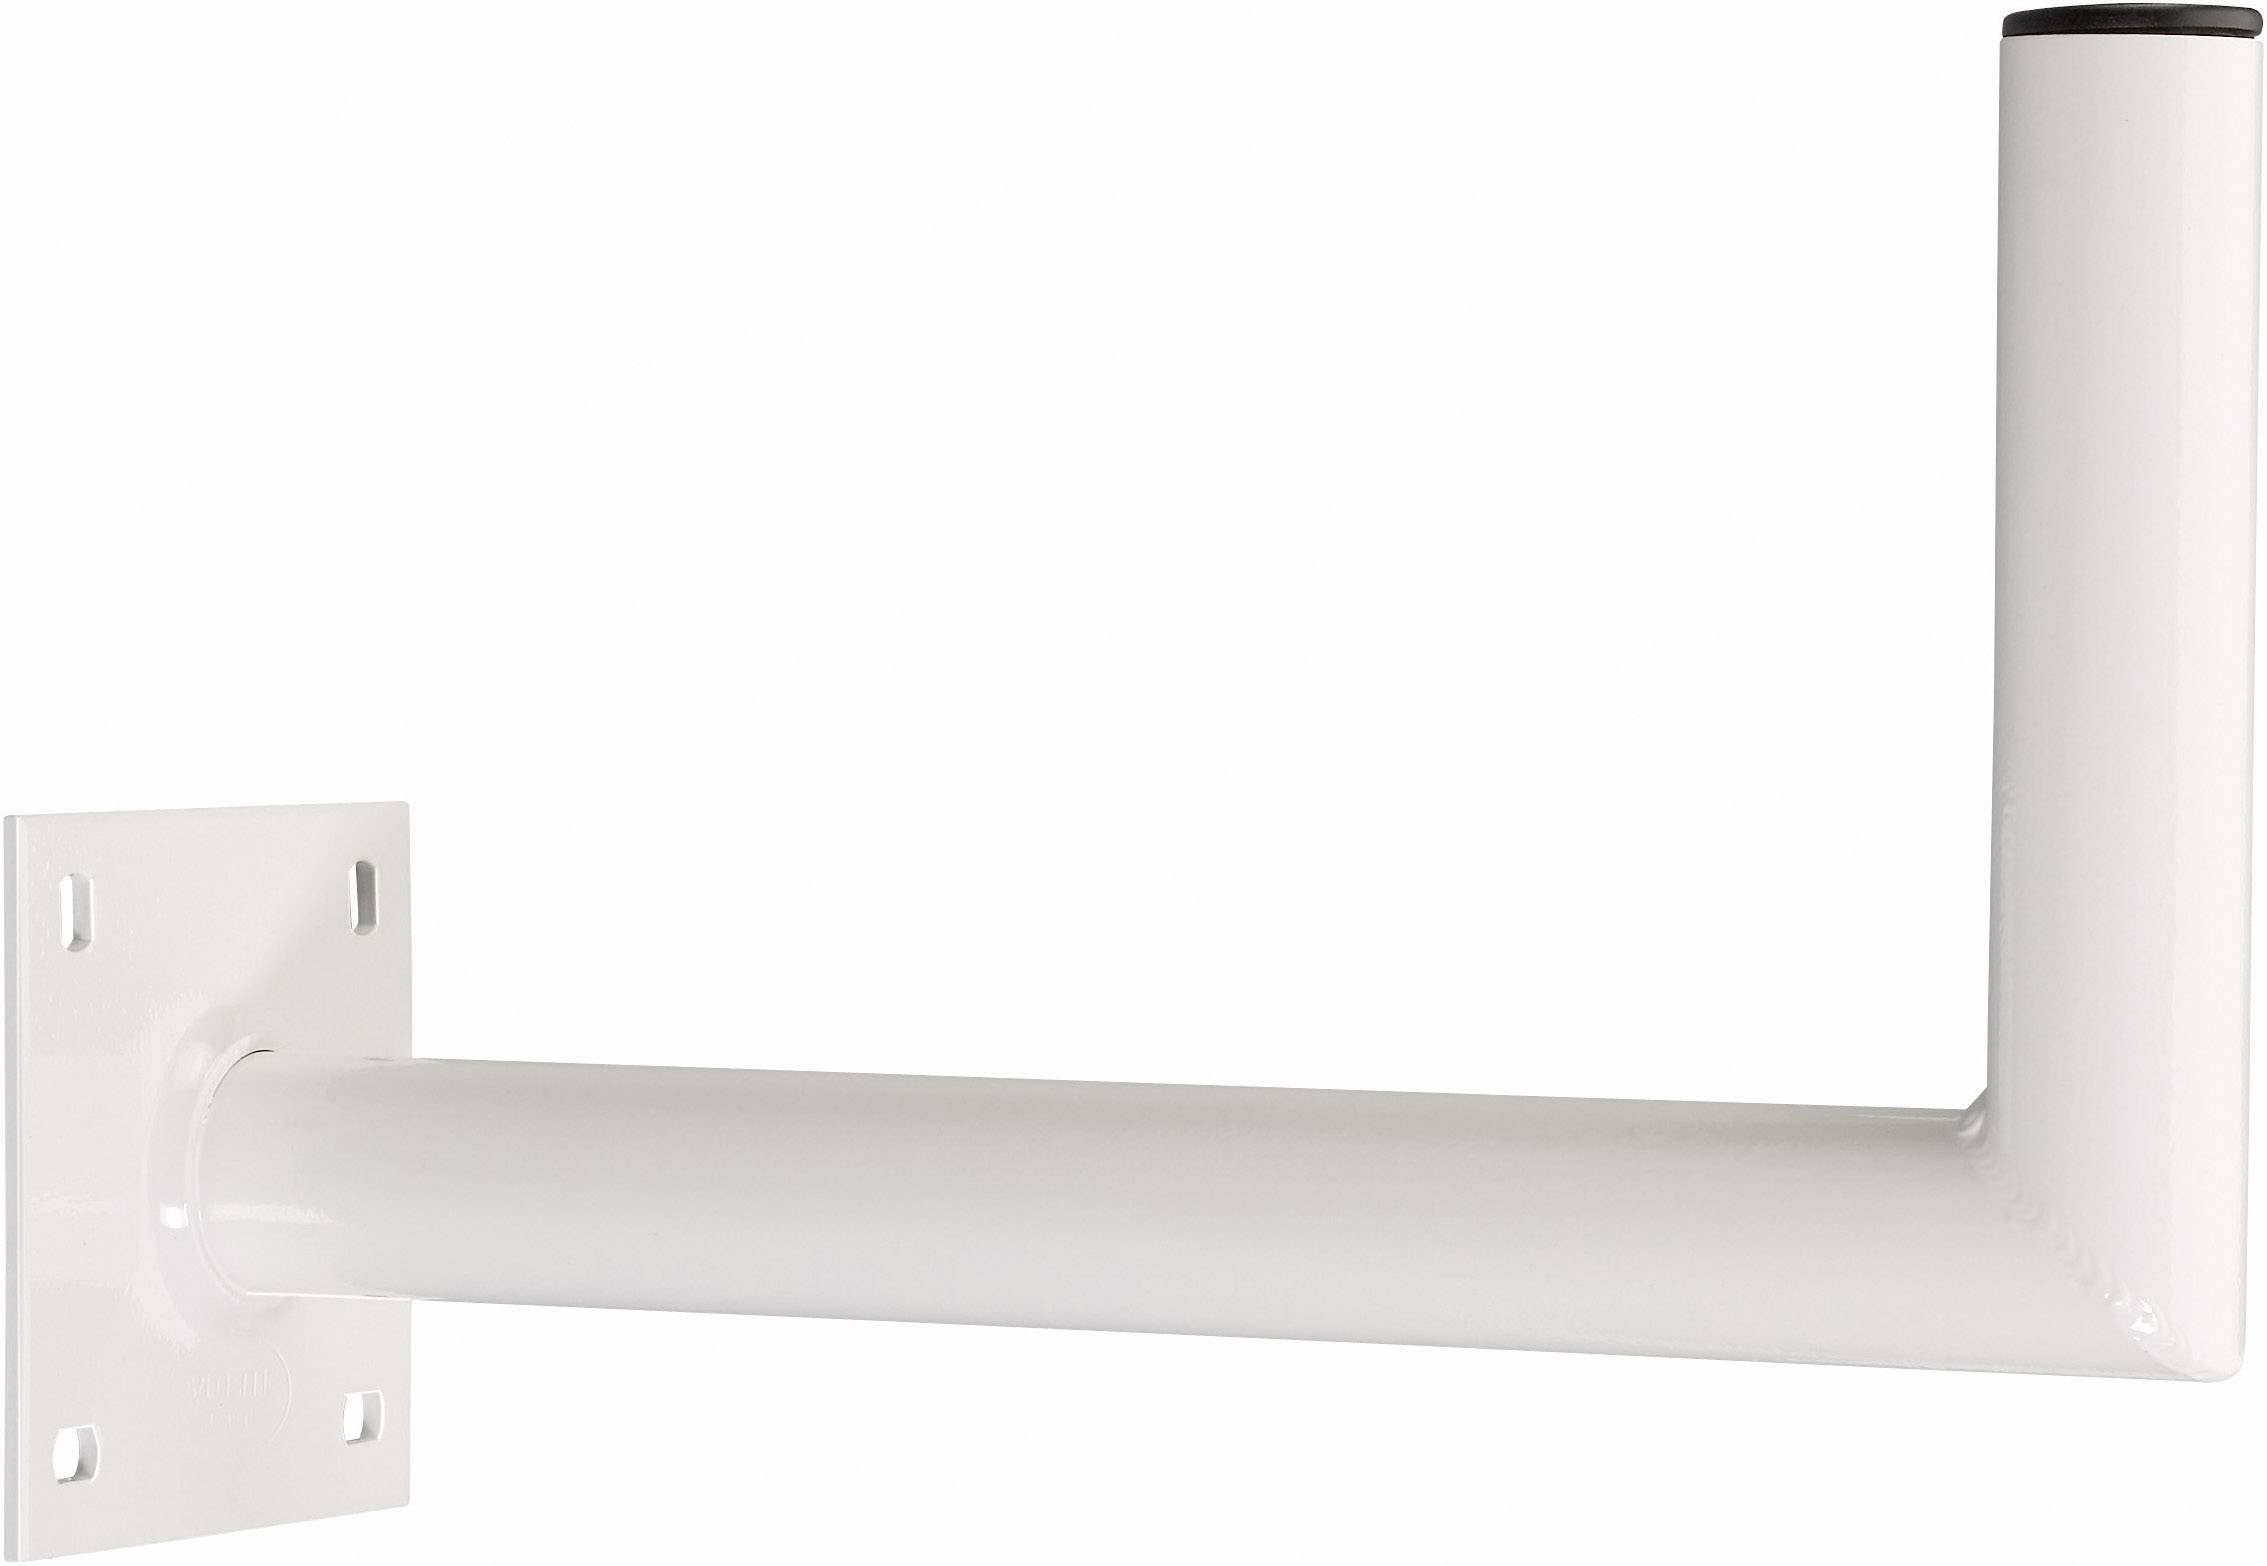 SAT stojan A.S. SAT 10745, 45 cm, Ø do 90 cm, hliník, bílá